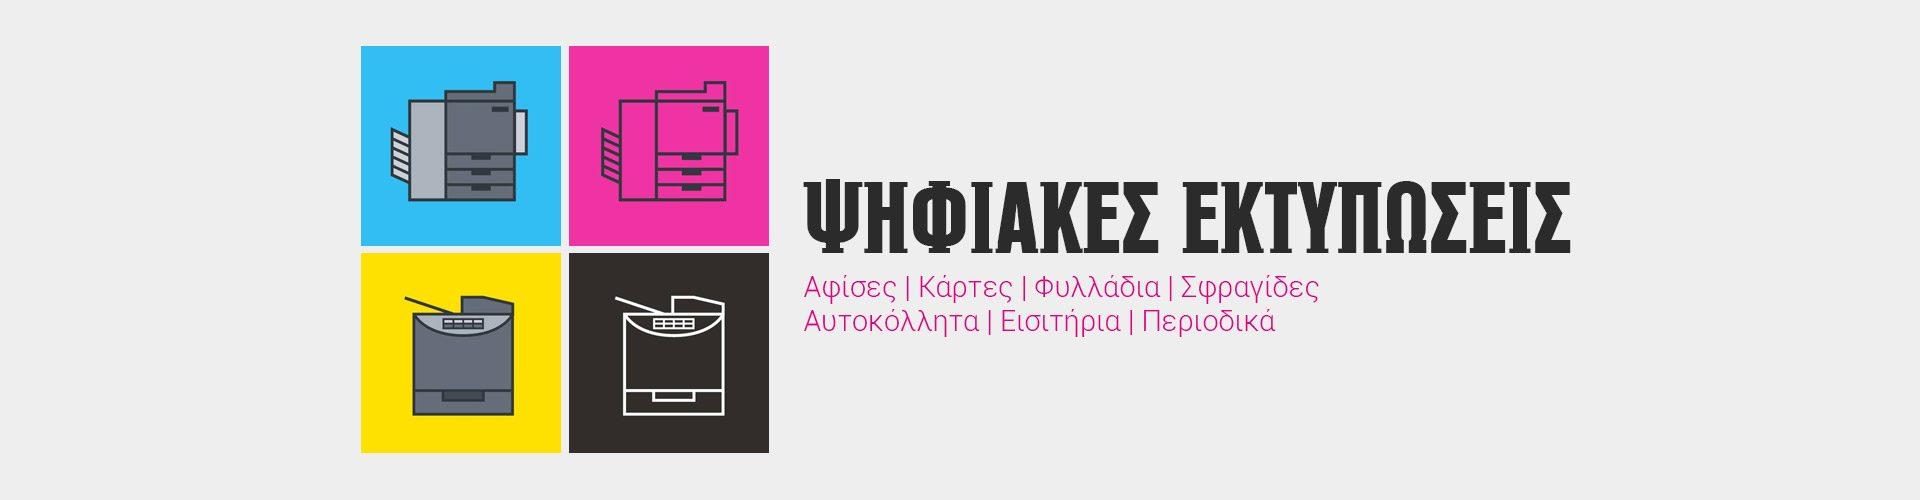 jambacopy-homepage-banner-ektypwseis-desktop